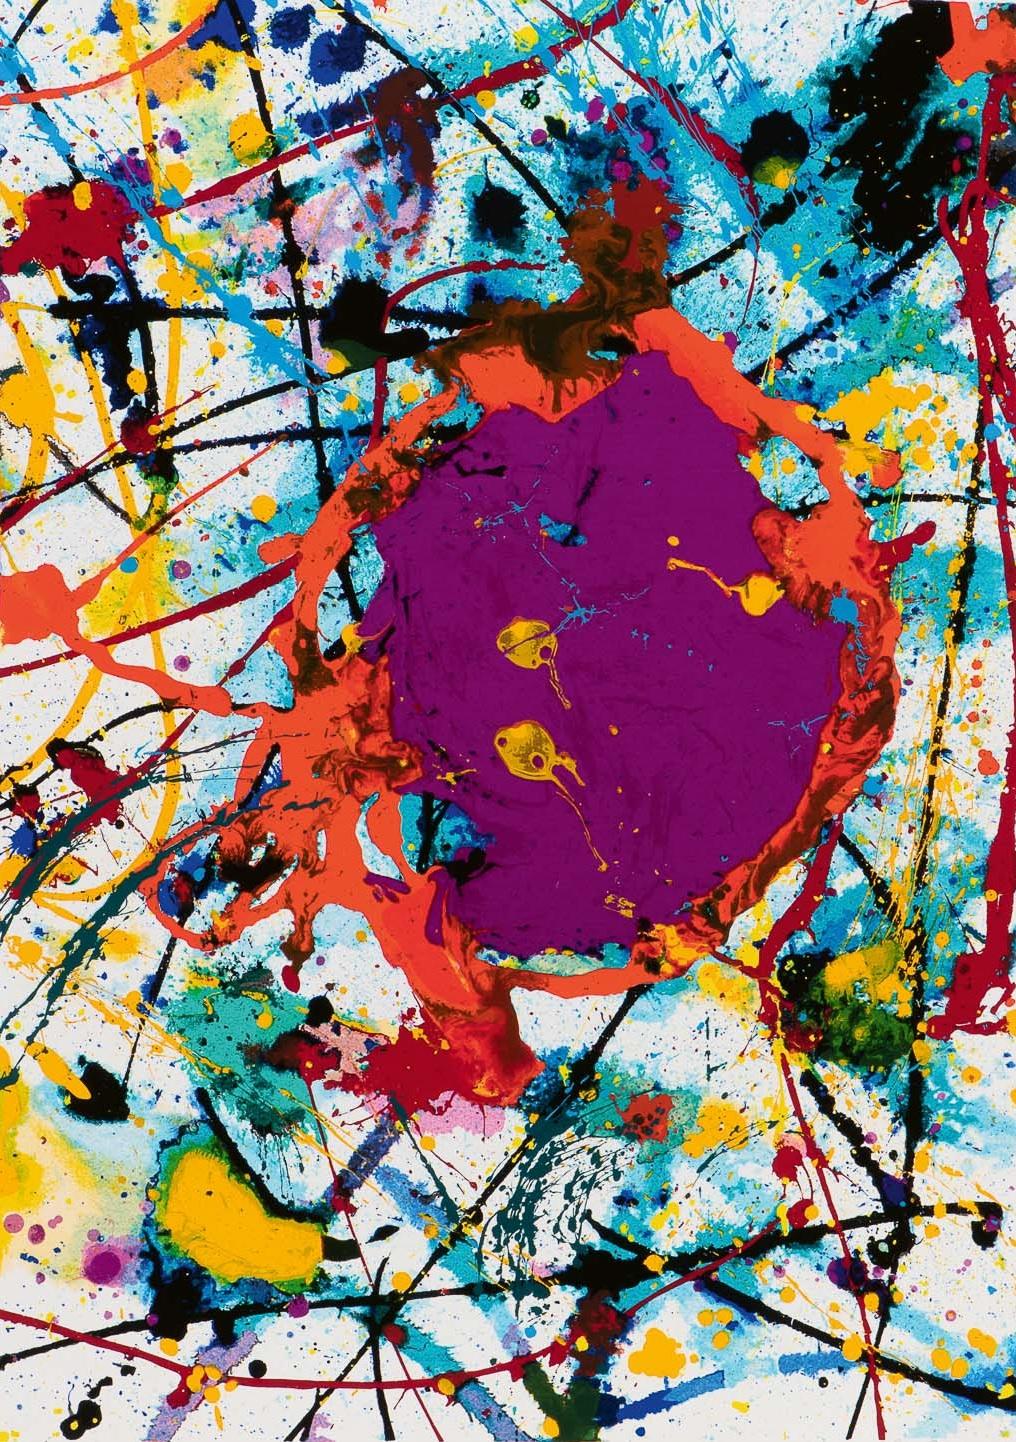 Composition (SFS 337) (1991)